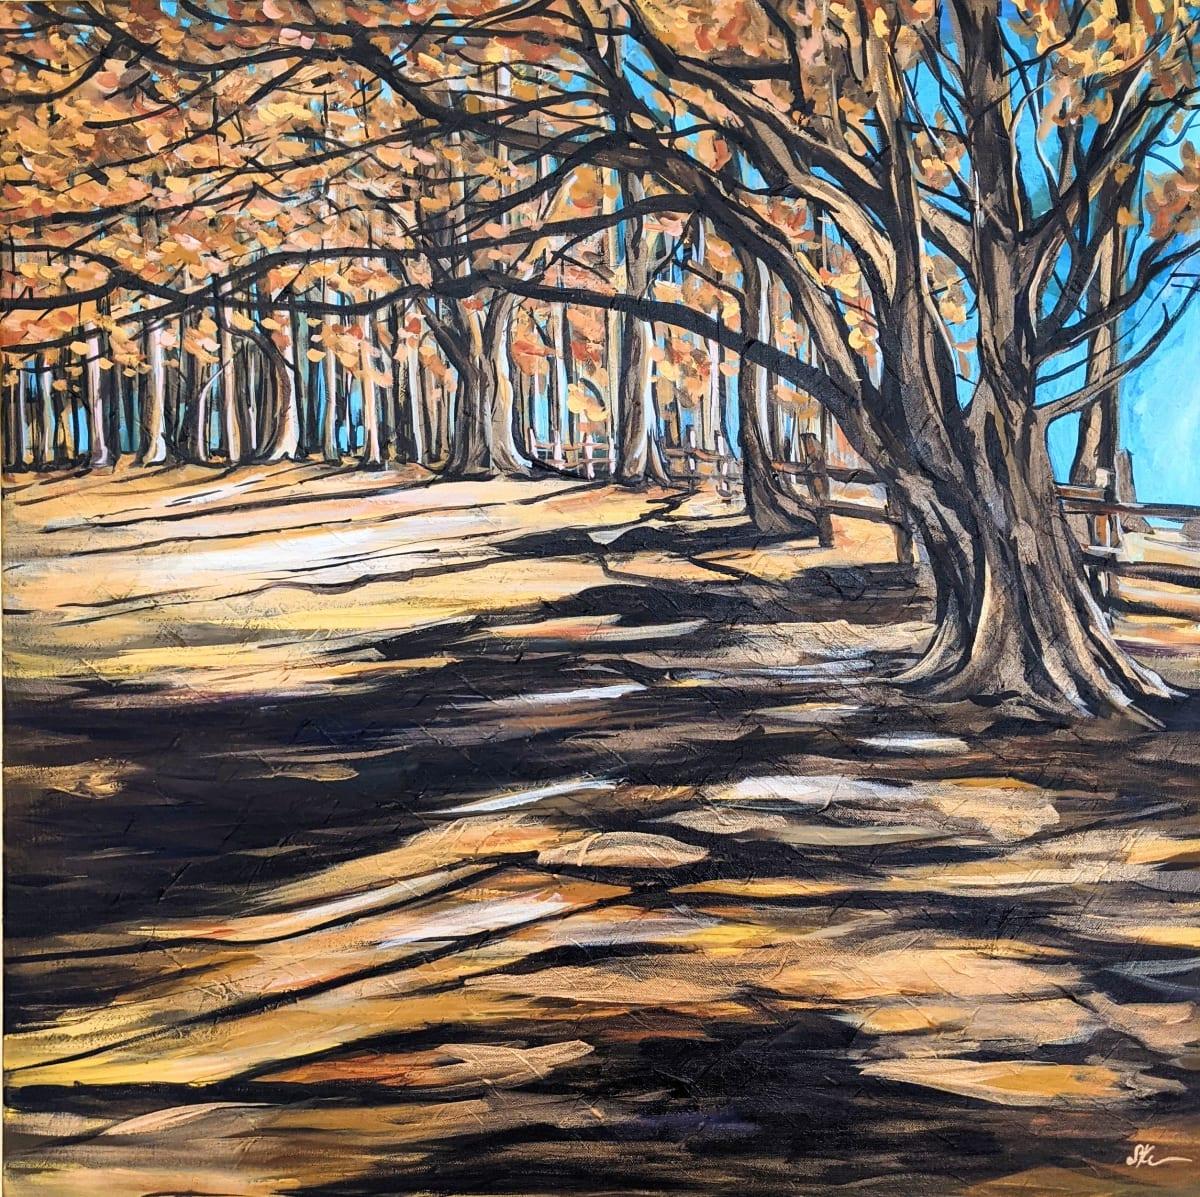 Fitzgerald Cypress Grove by Sonya Kleshik